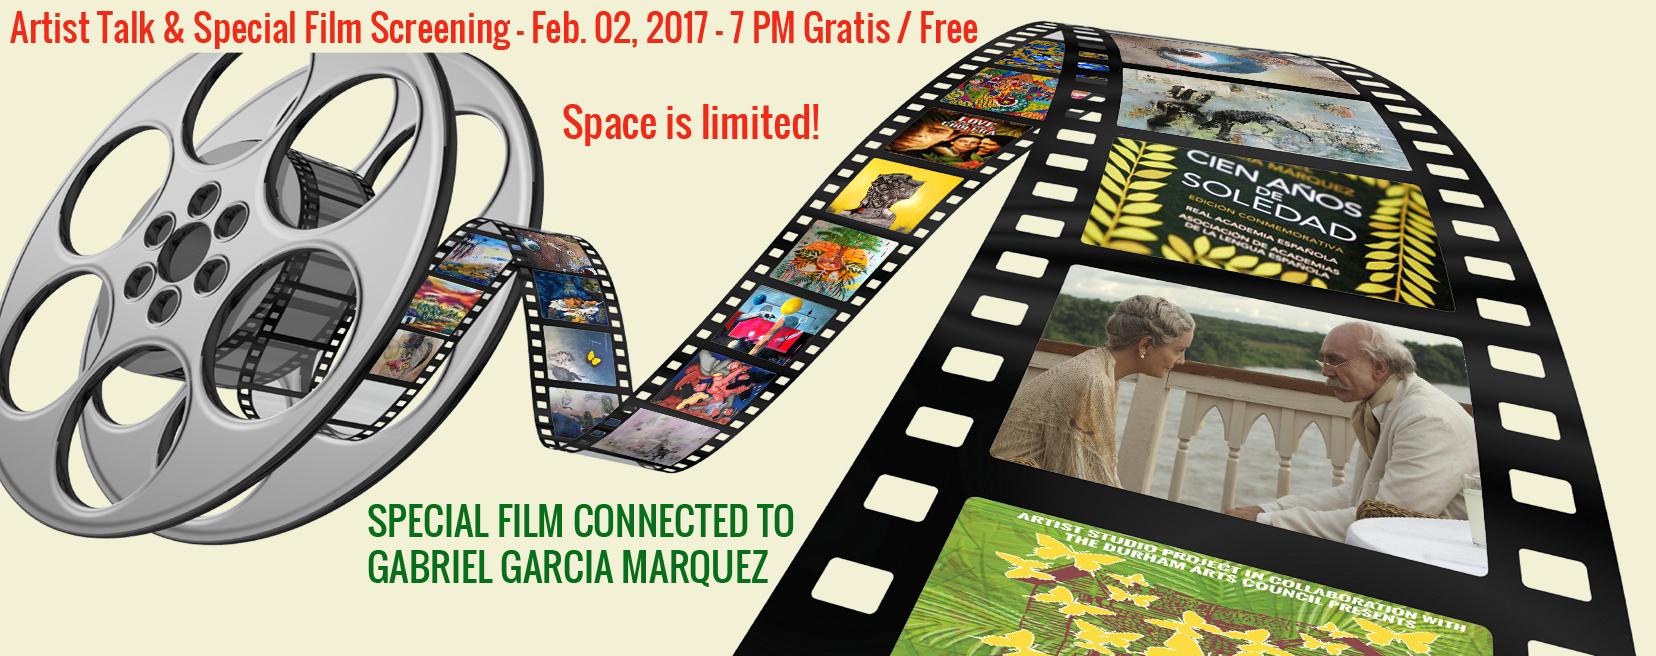 Artist Talk and Film Screening Gabriel Garcia Marquez